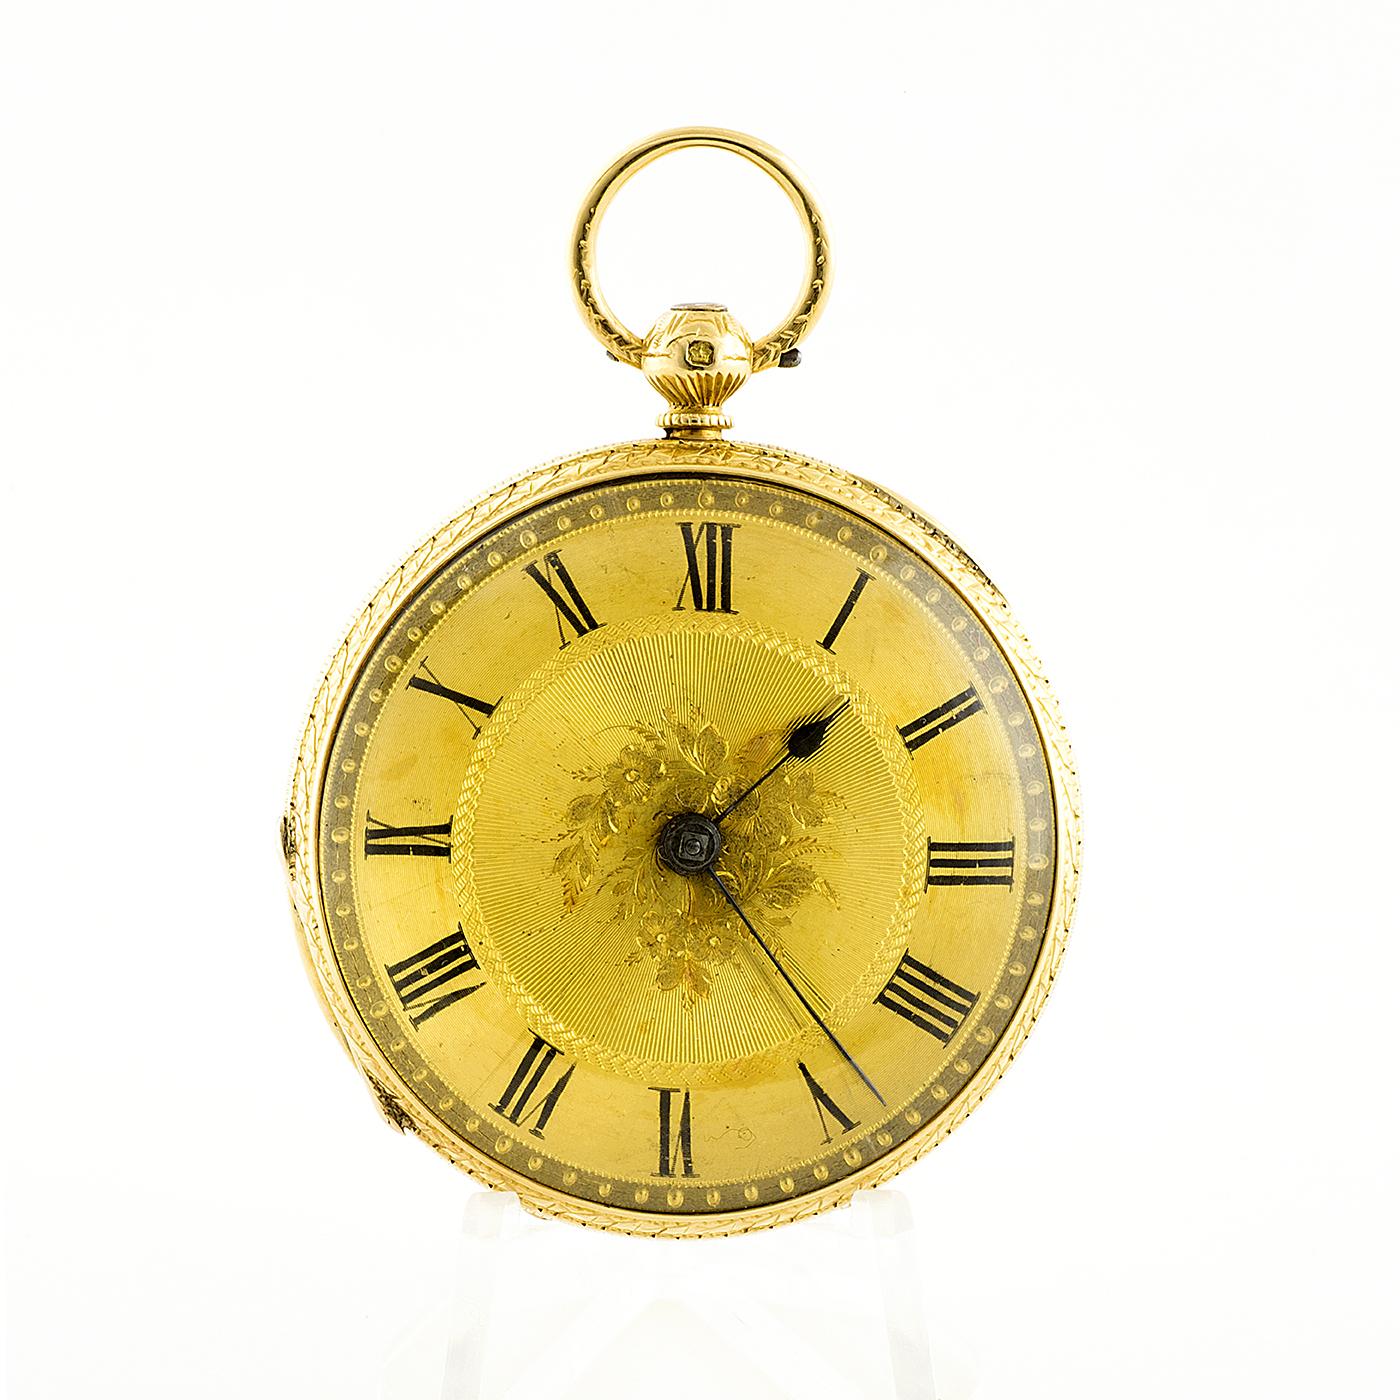 Parsons (Ealing, Londres). Reloj de Bolsillo Half Fusee (Semicatalino), lepine. Chester, 1870. Oro 18k.